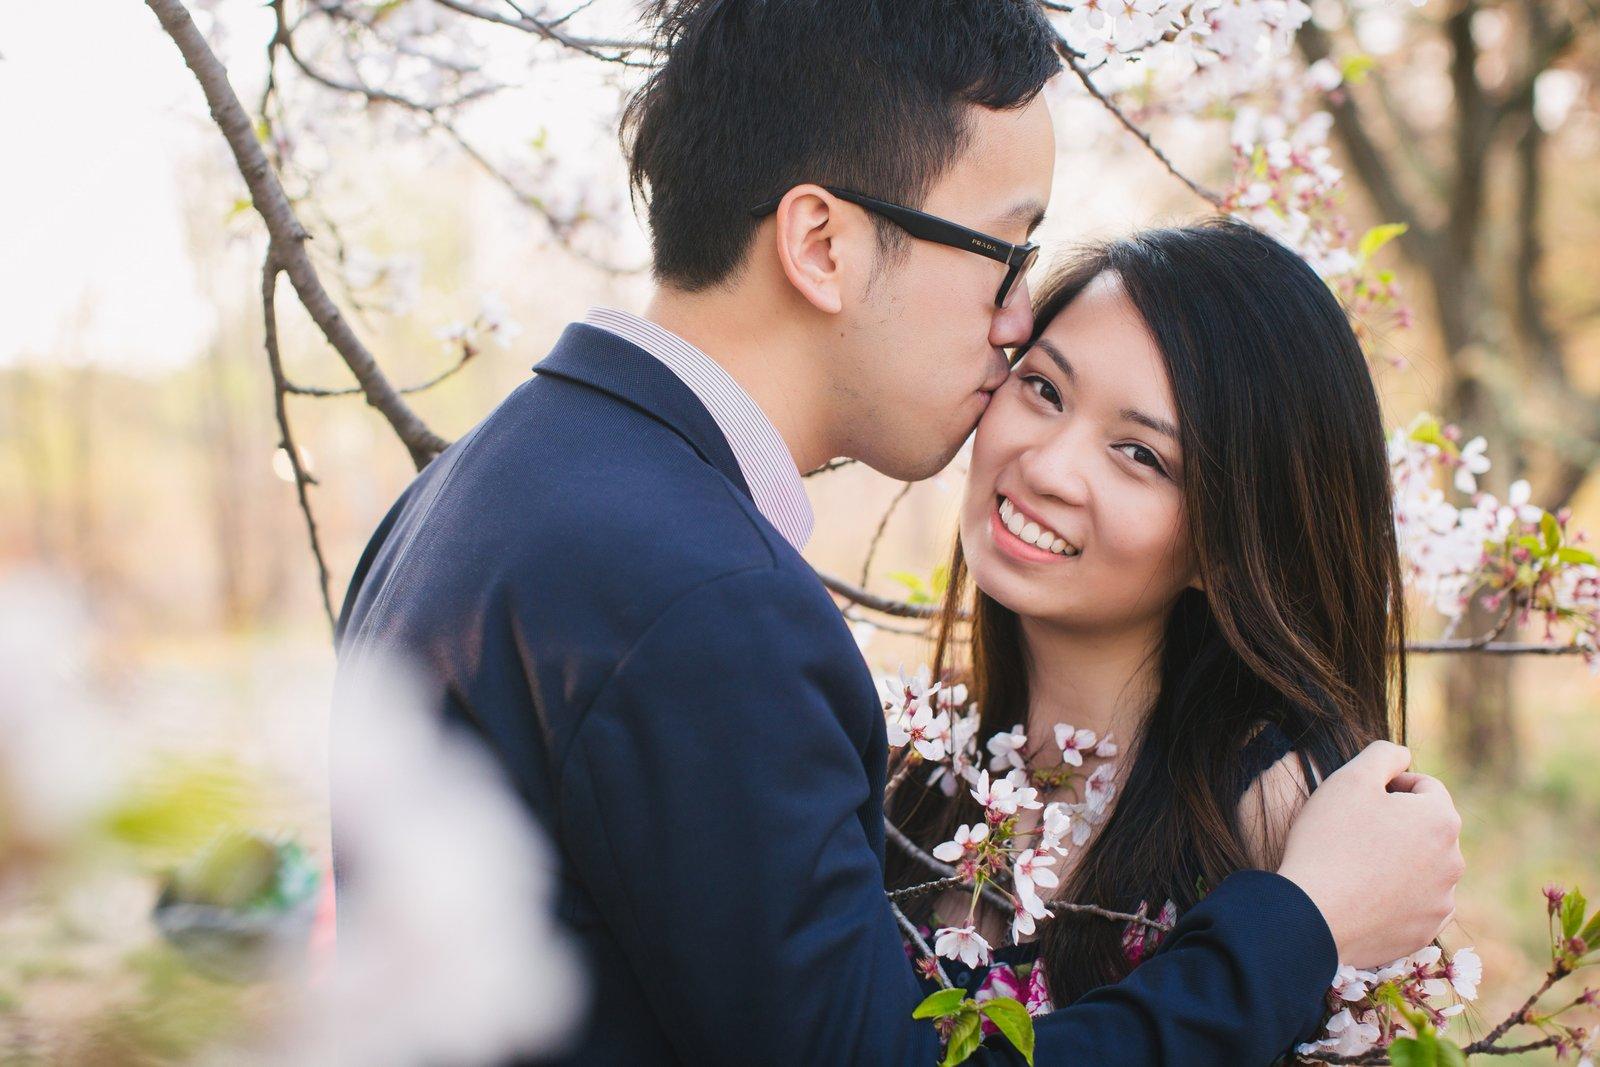 Jessica-Charles-Engagement-High-Park-Cherry-Blossom-015